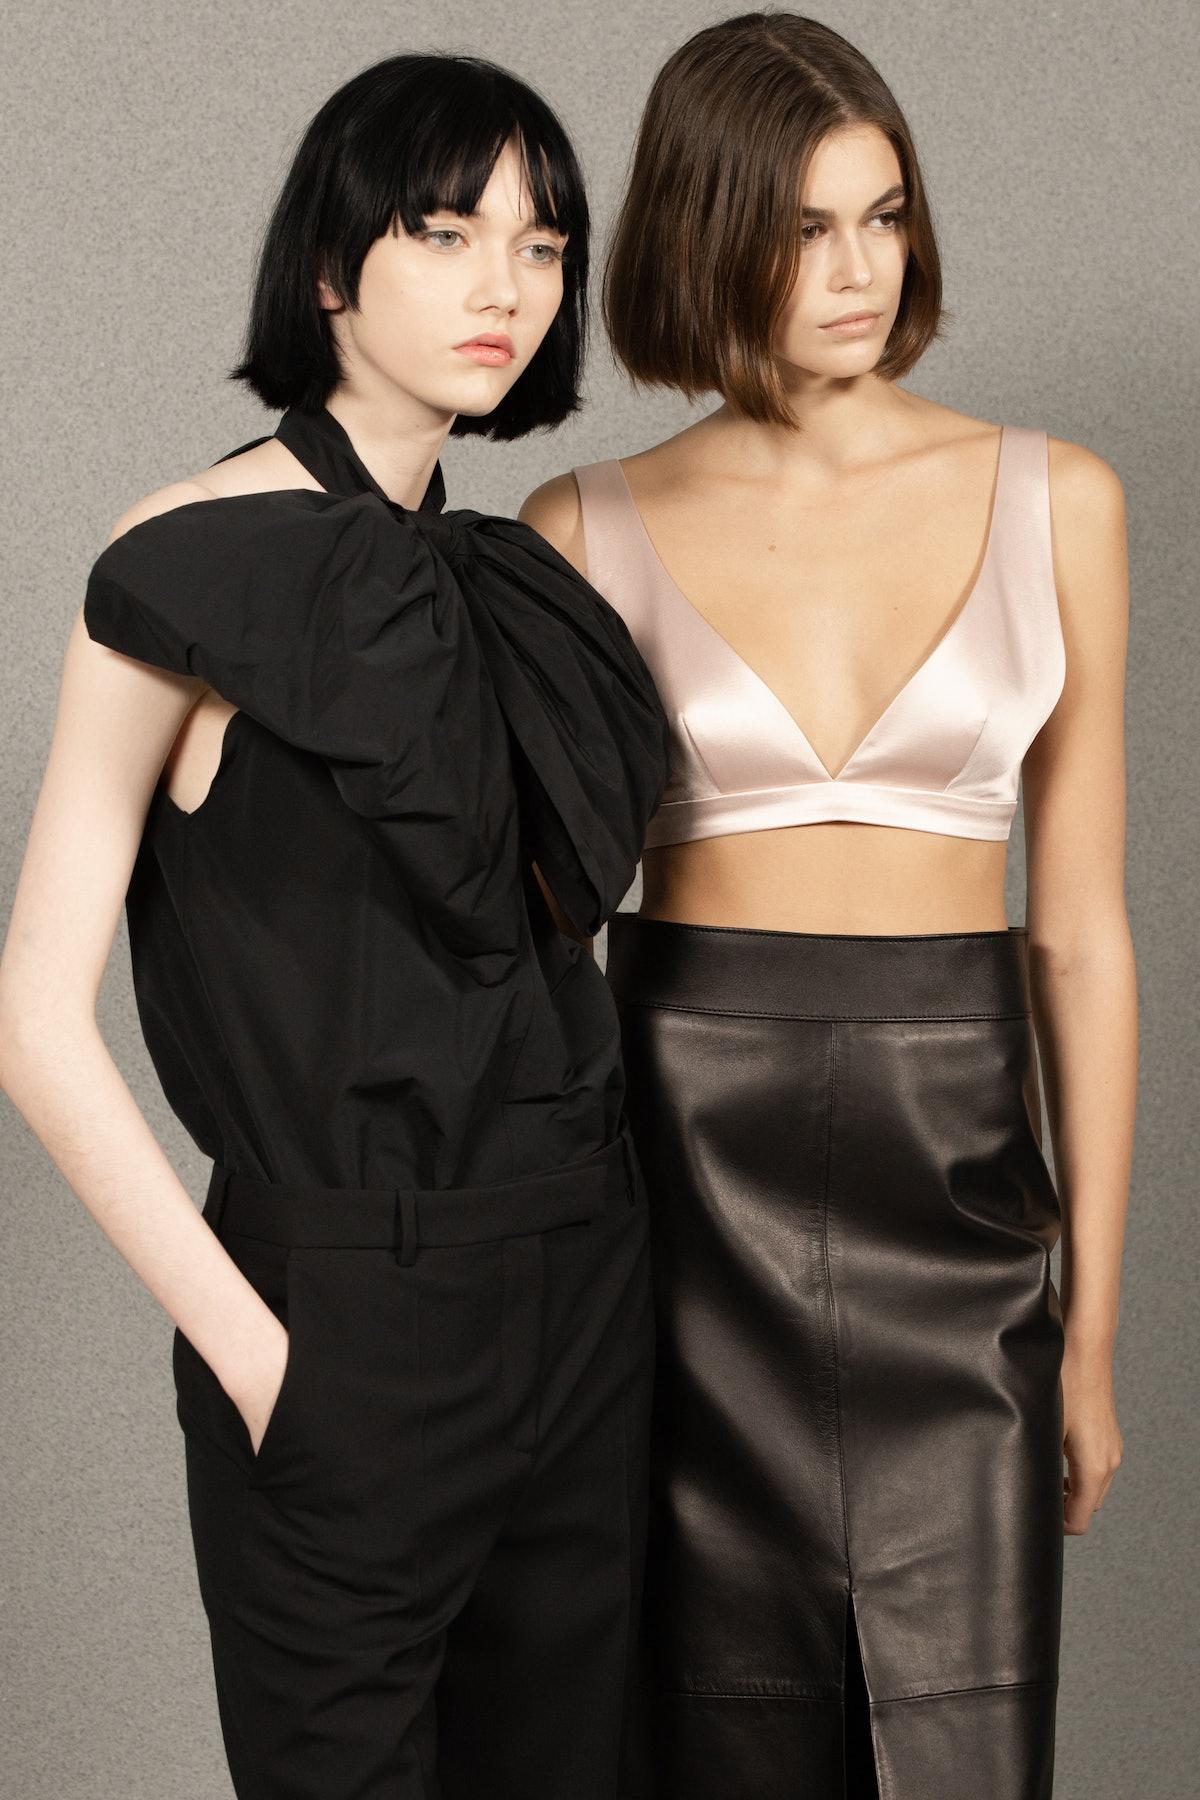 Serichai_Givenchy-116.jpg